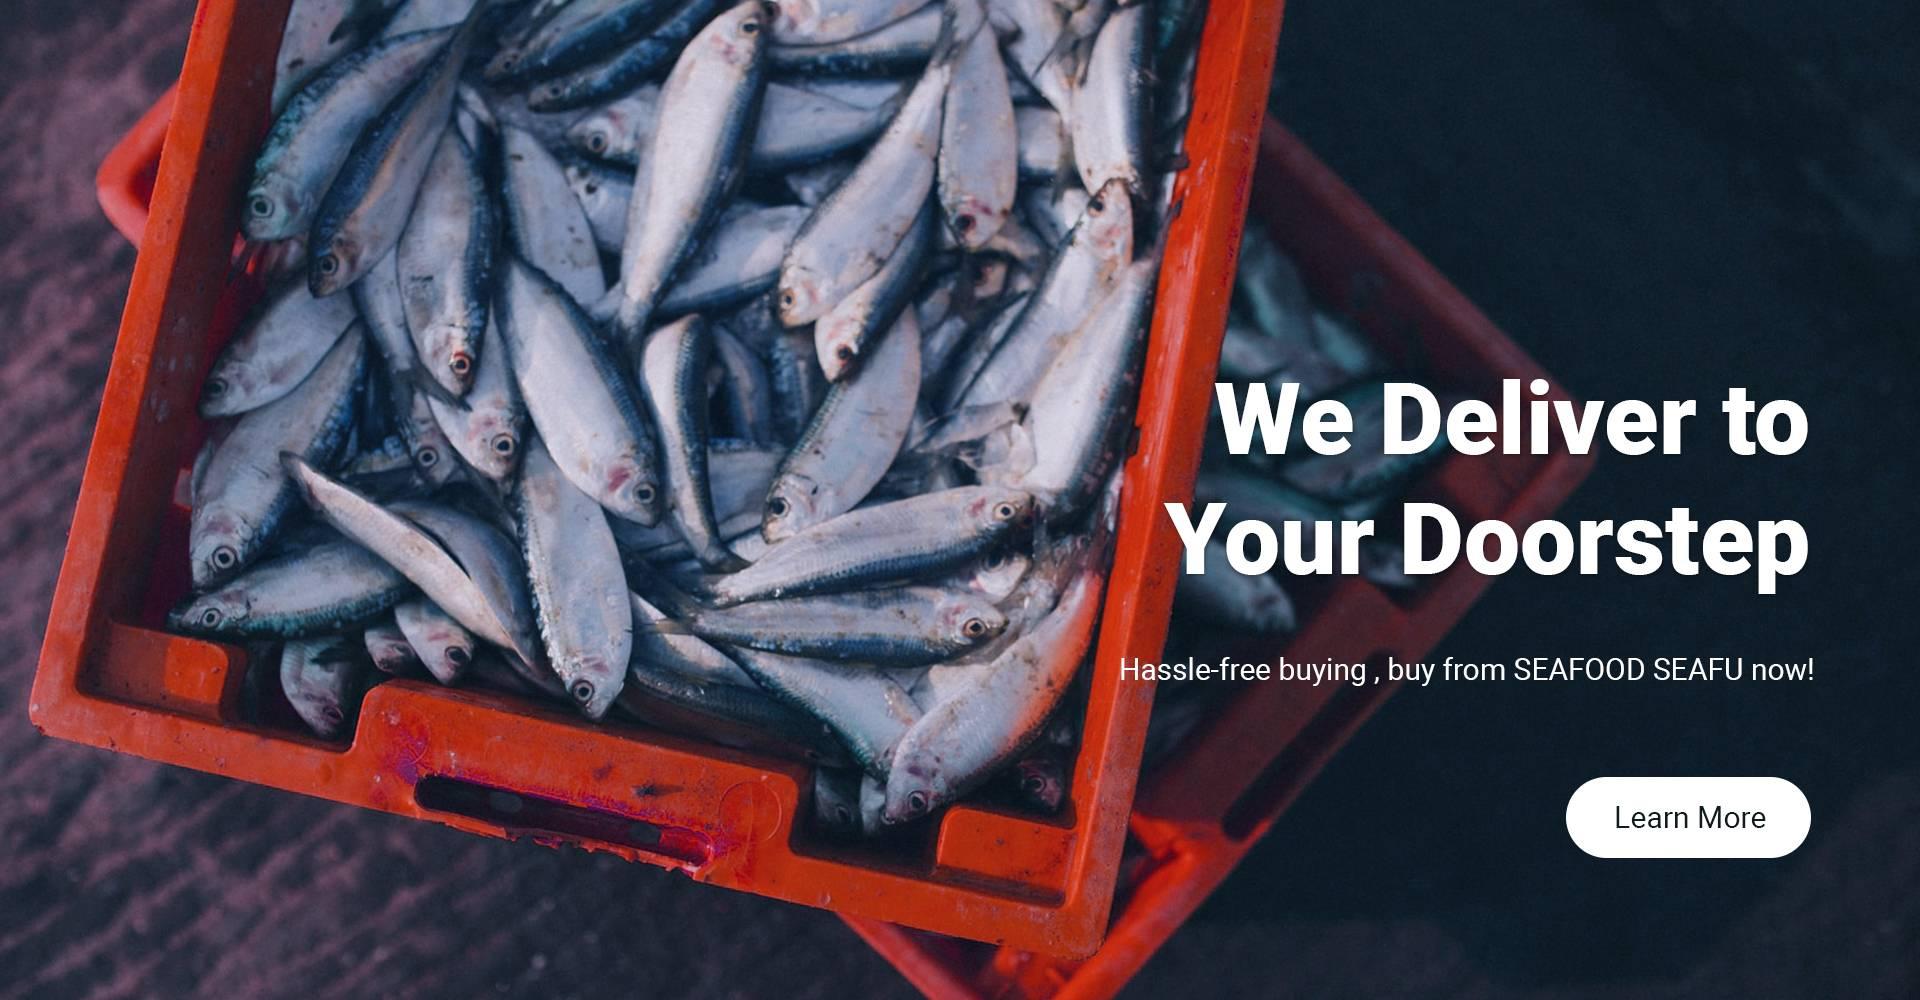 https://www.seafoodseafu.unicarttemplates.co/faq